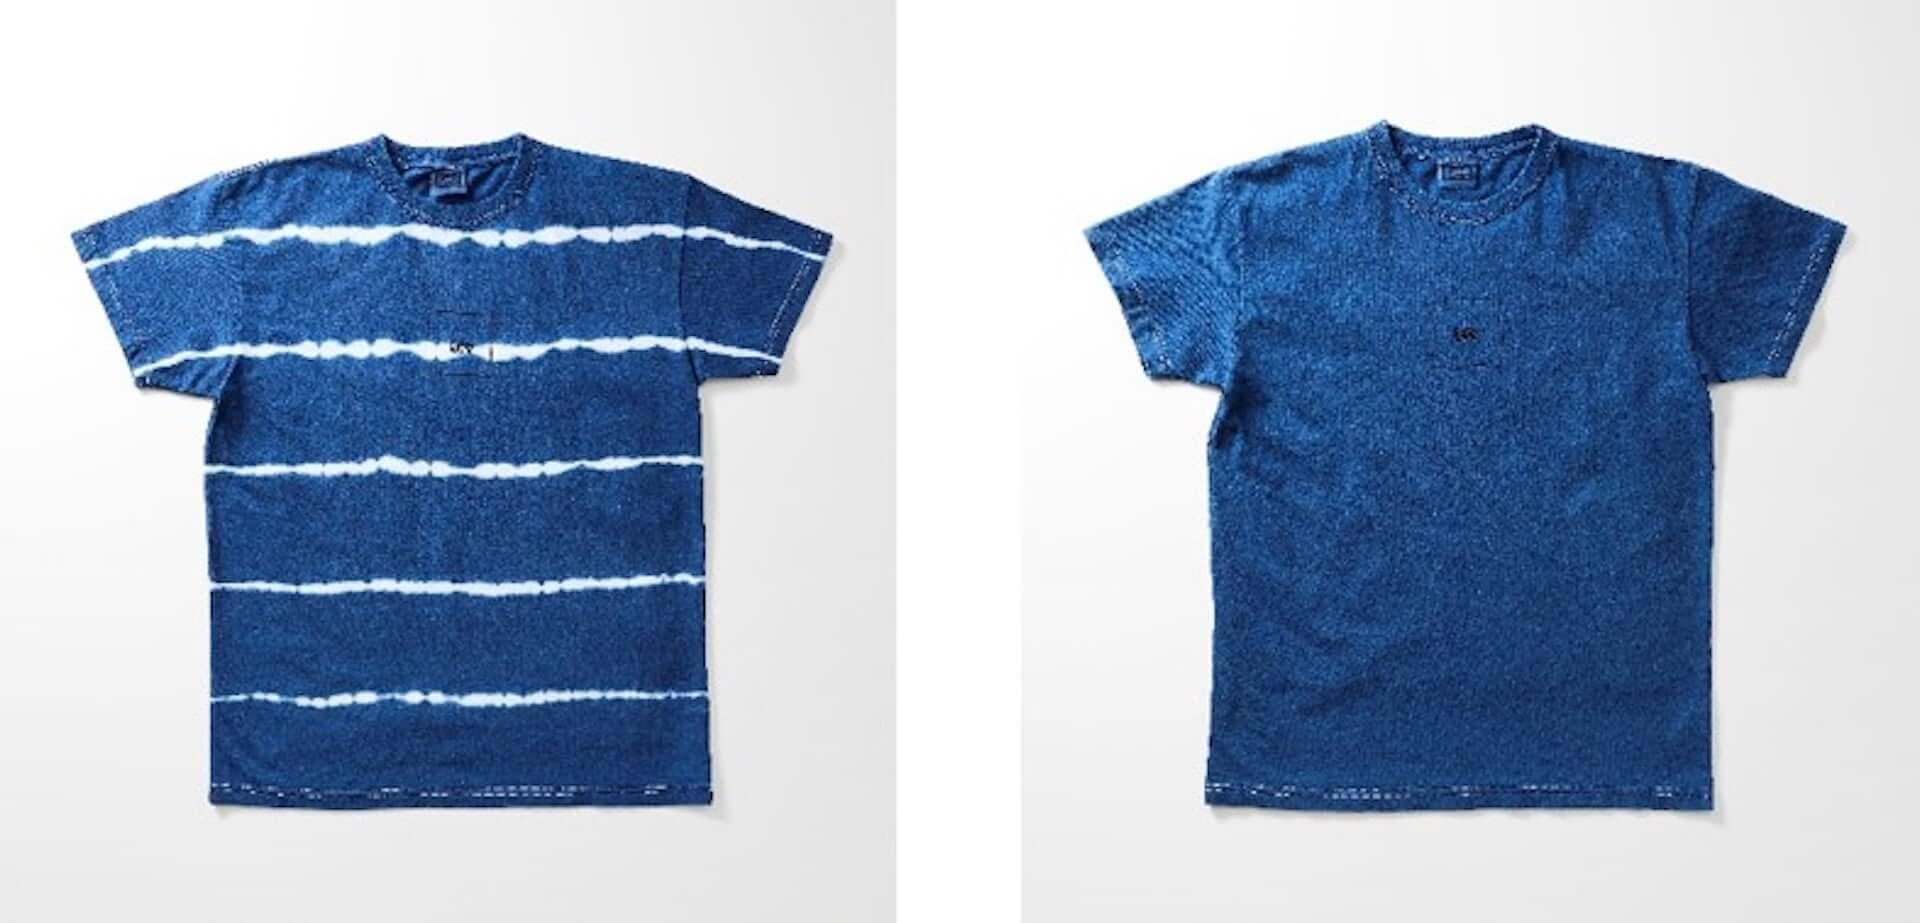 Lee原宿店で今夏注目の天然インディゴ染めTシャツやジャケットが移転1周年記念限定発売! lf200529_lee_indigo_3-1920x923